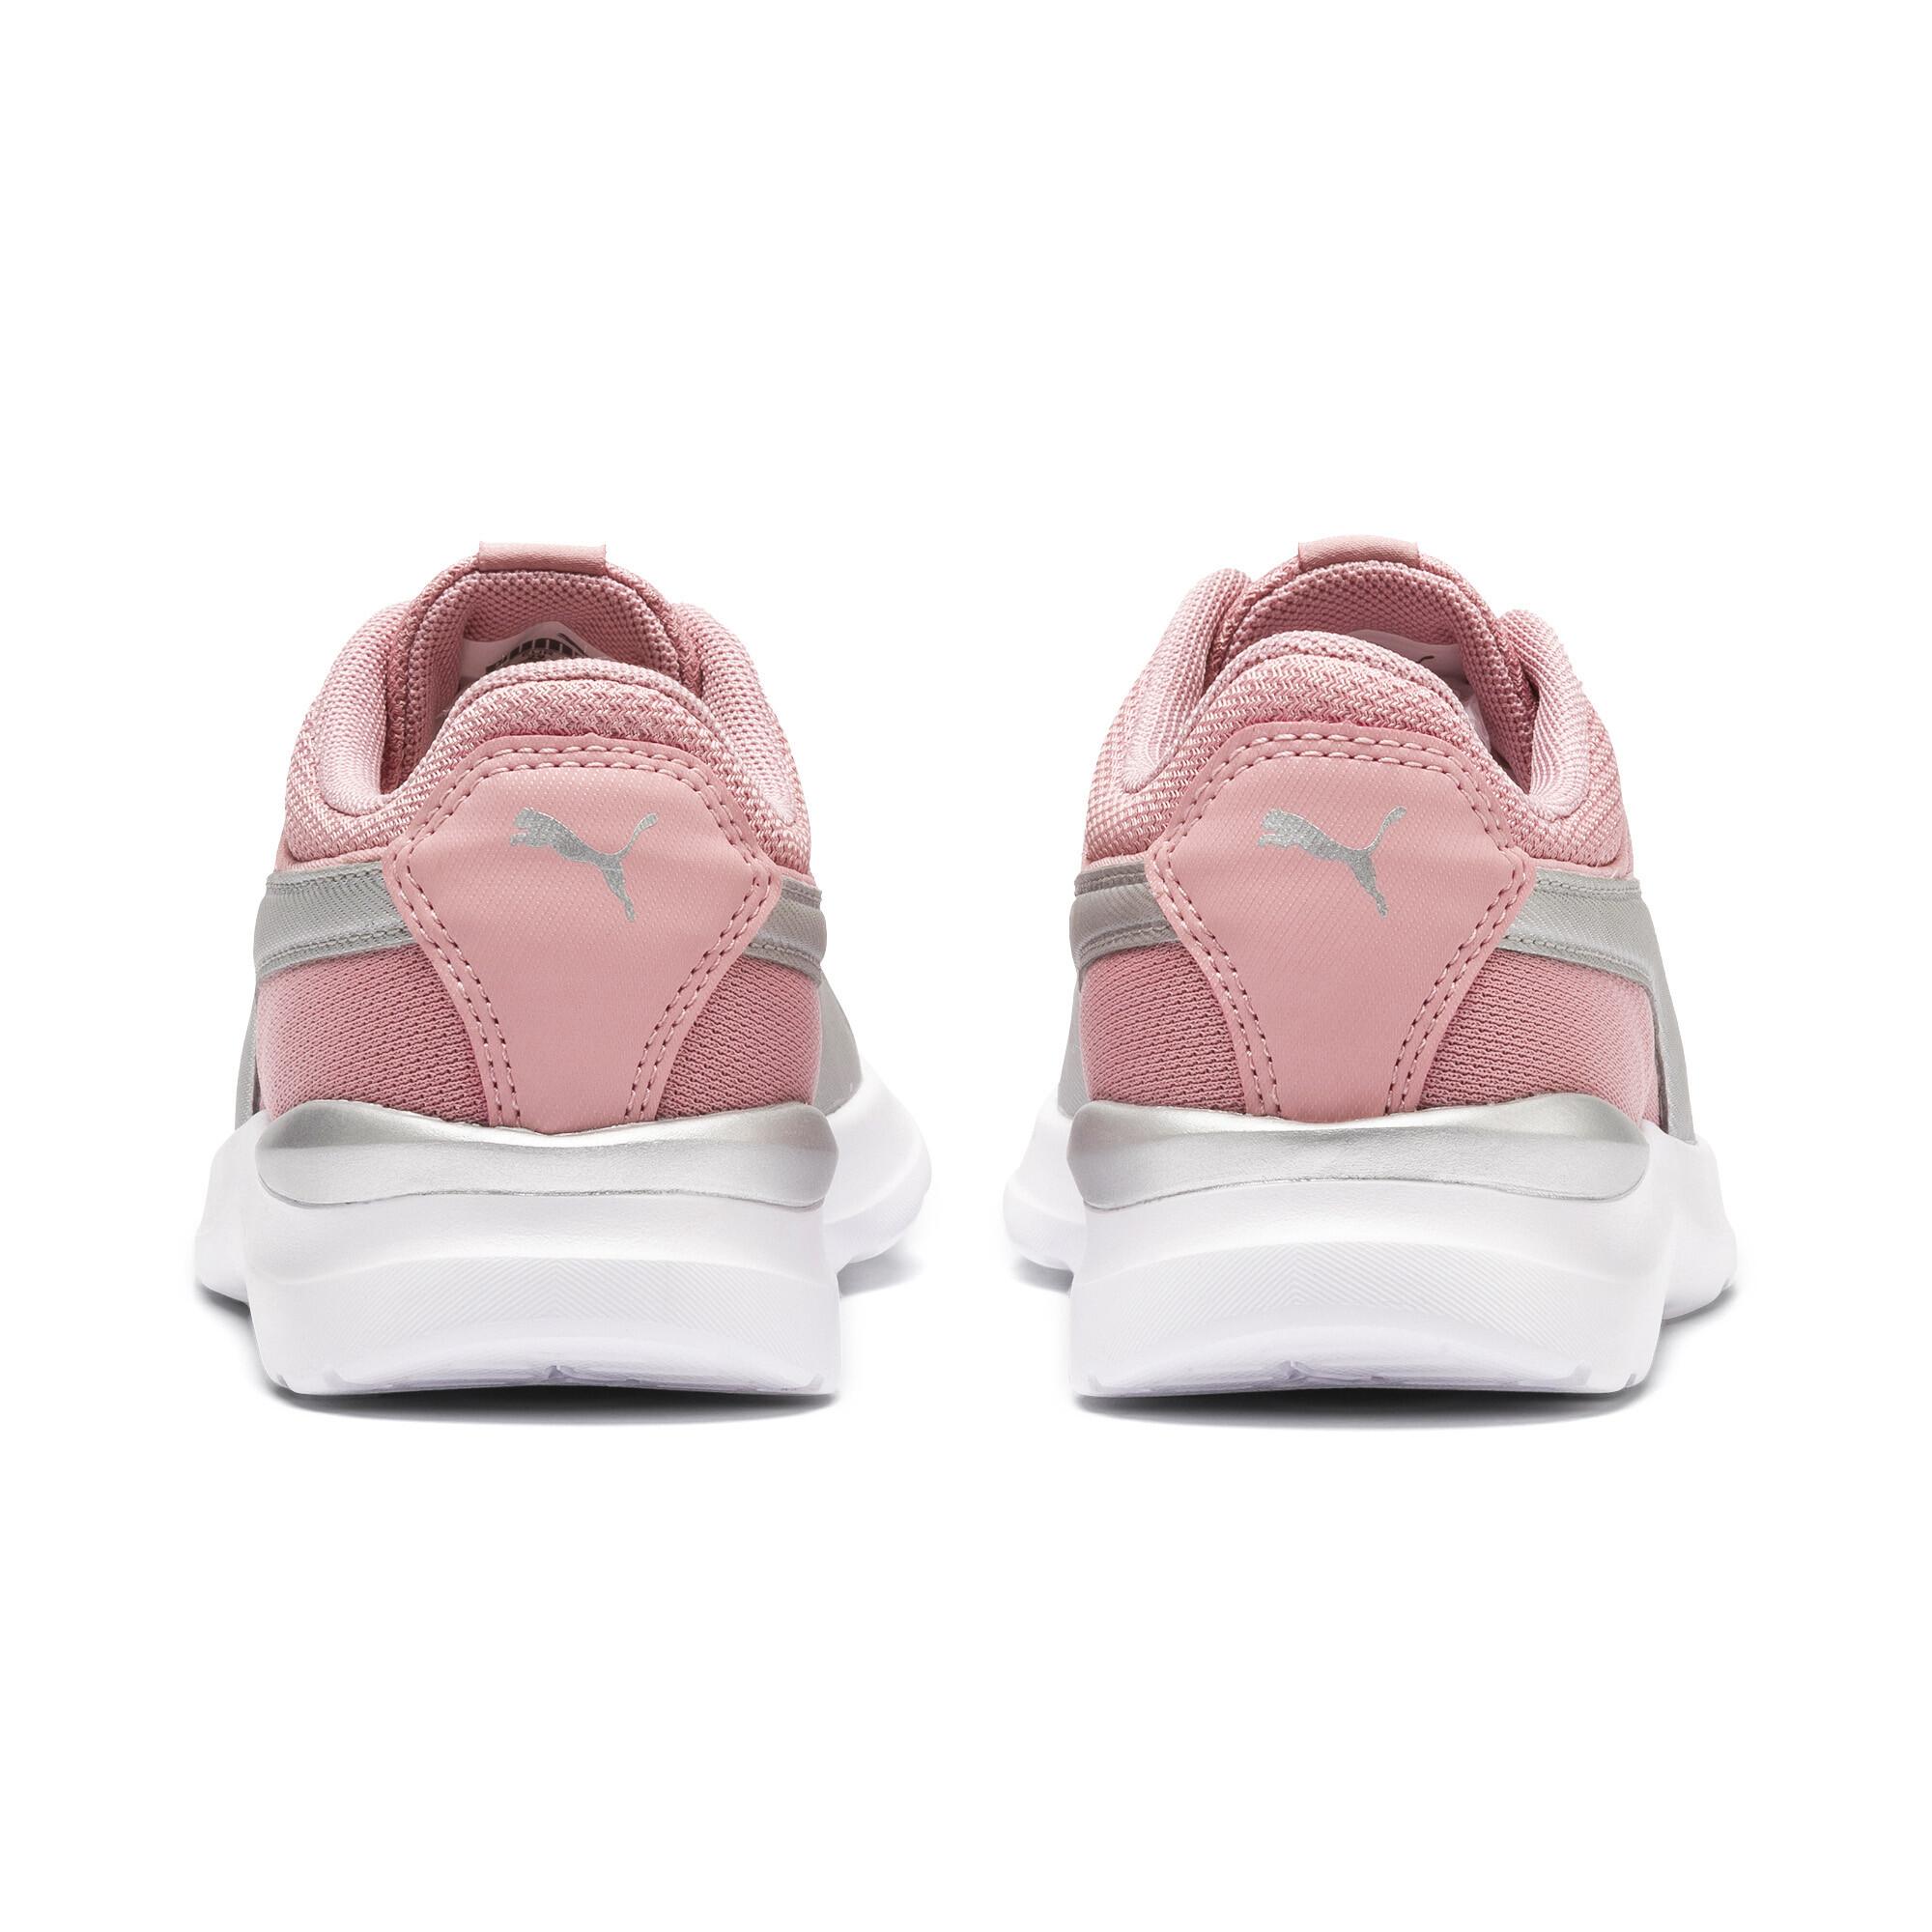 PUMA-Adela-Breathe-AC-Sneakers-PS-Girls-Shoe-Kids thumbnail 9